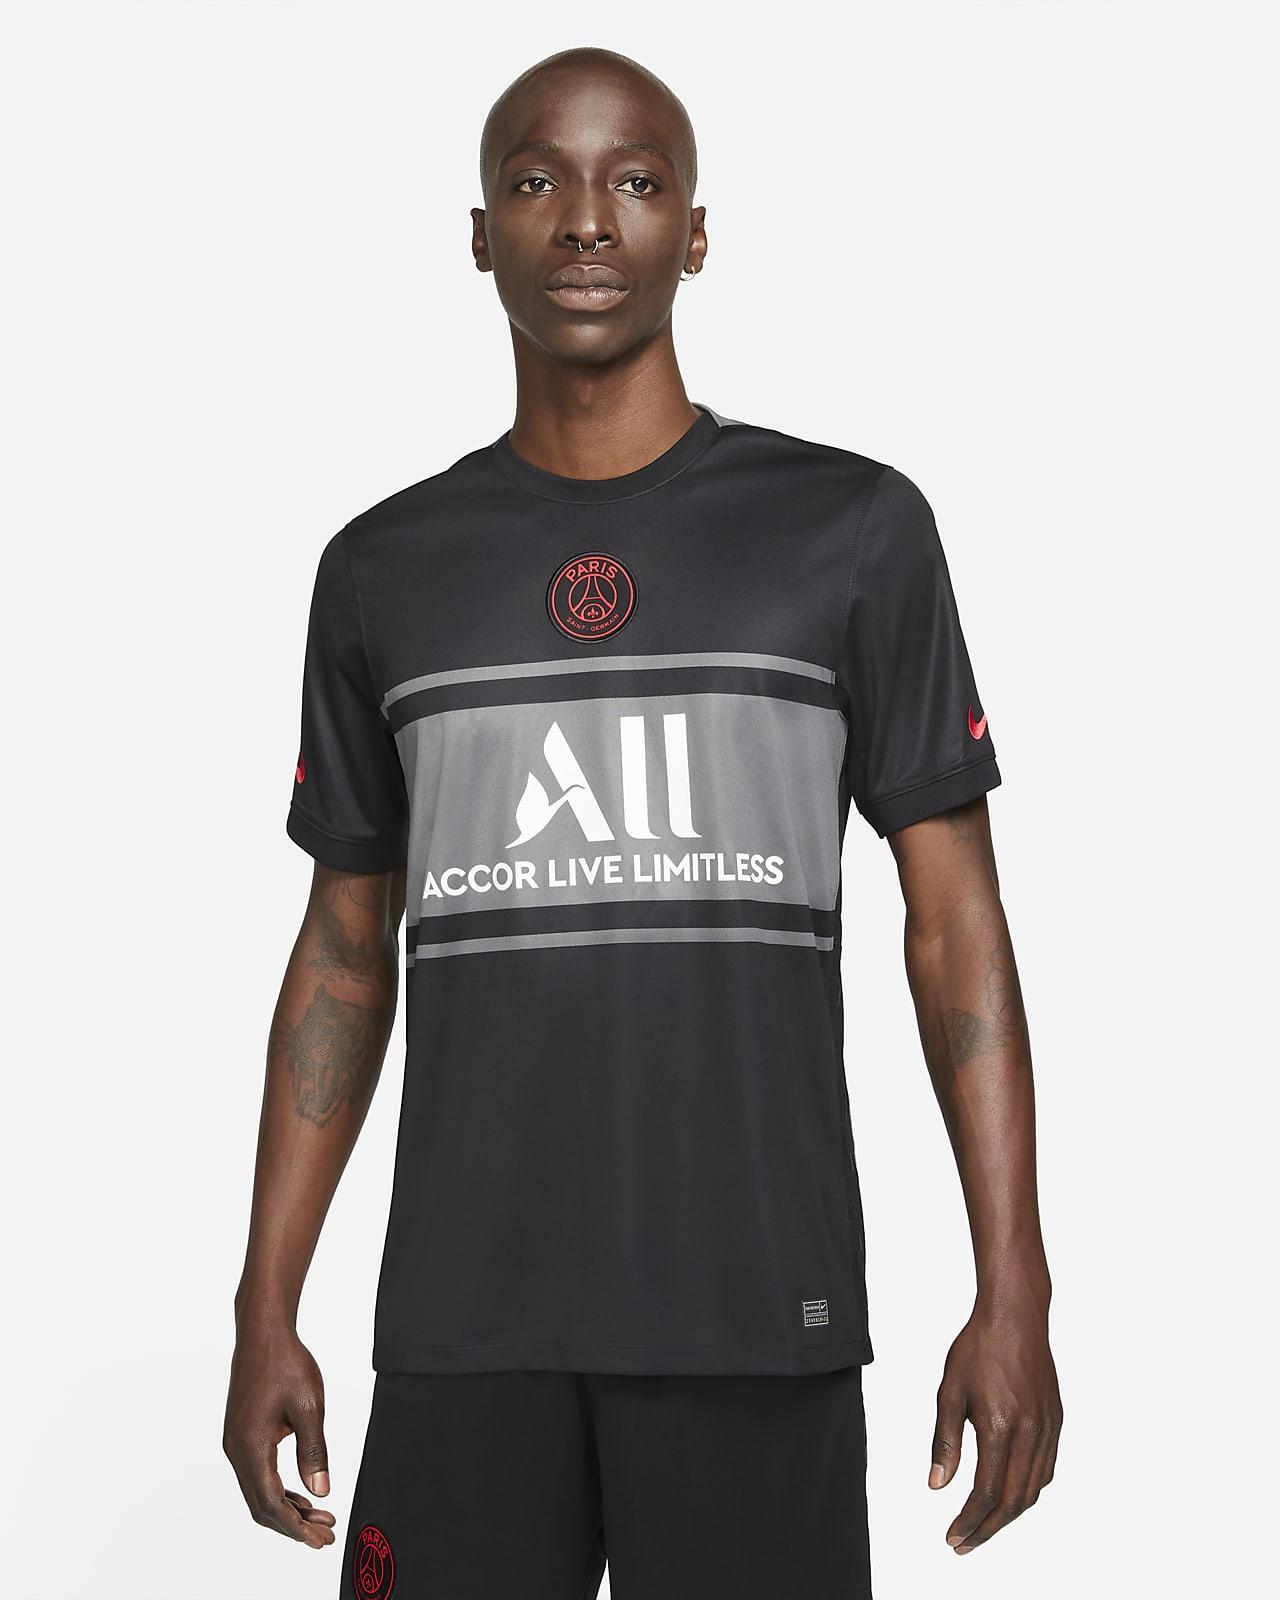 Jersey de fútbol Nike Dri-FIT ADV del Paris Saint-Germain alternativa 2021/22  Stadium para hombre